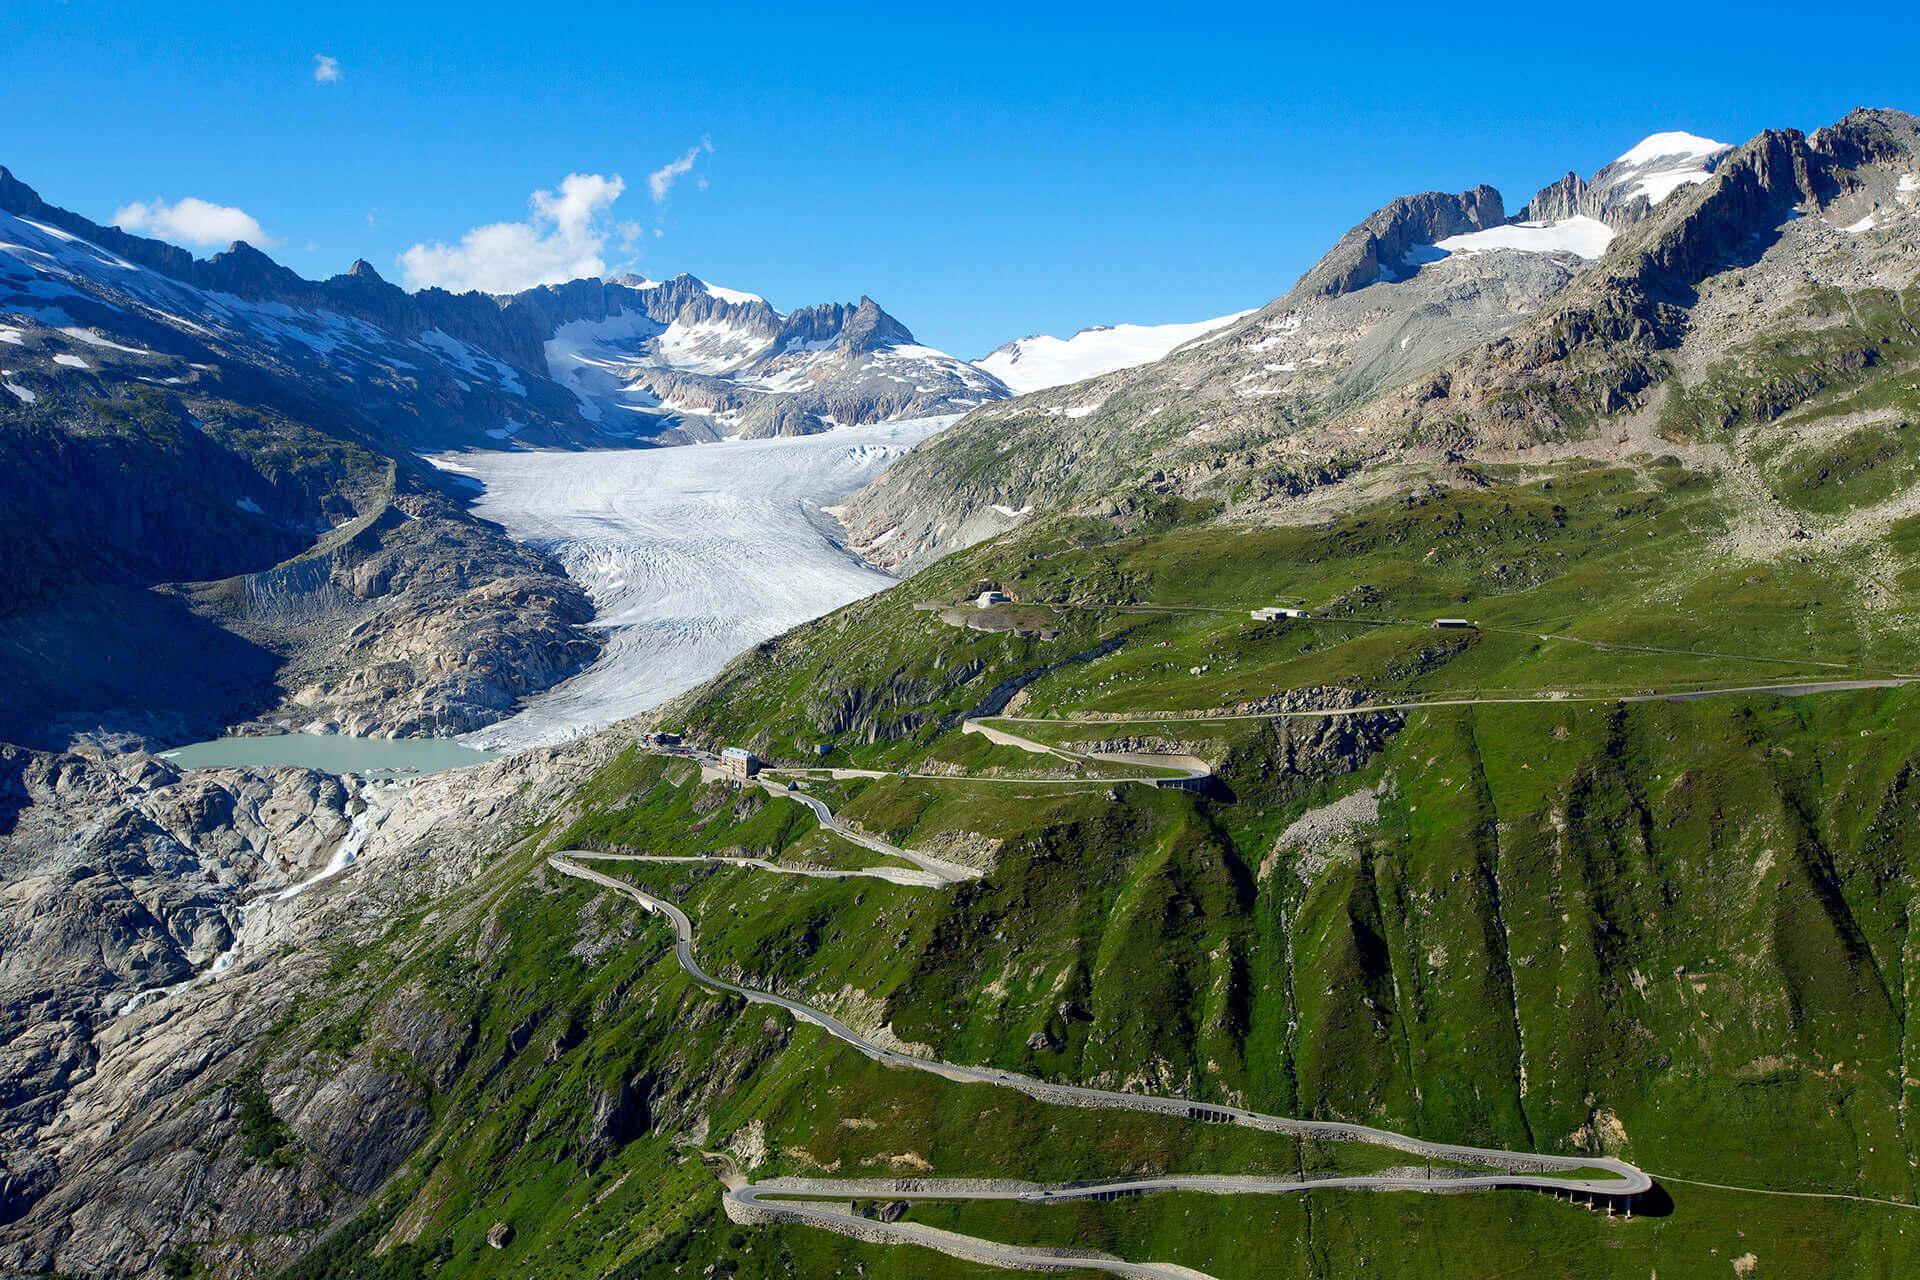 Le fleuve Rhône, Km 0 Canton du Valais, Col de la Furka, Glacier du Rhône